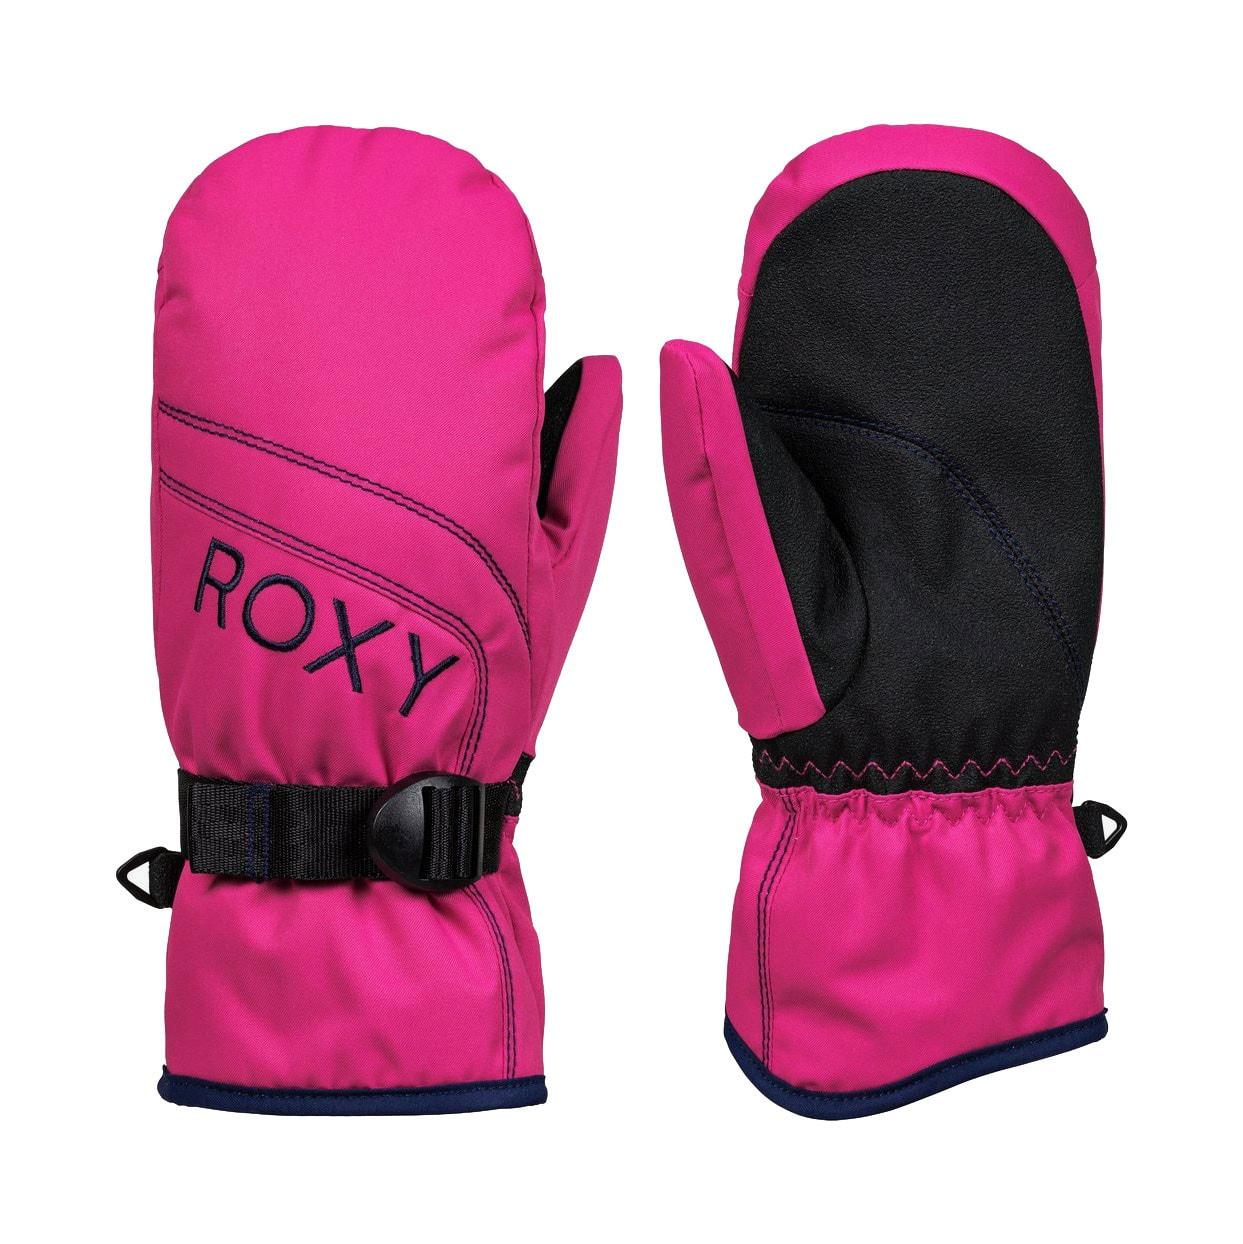 Roxy Jetty Girl Mitt